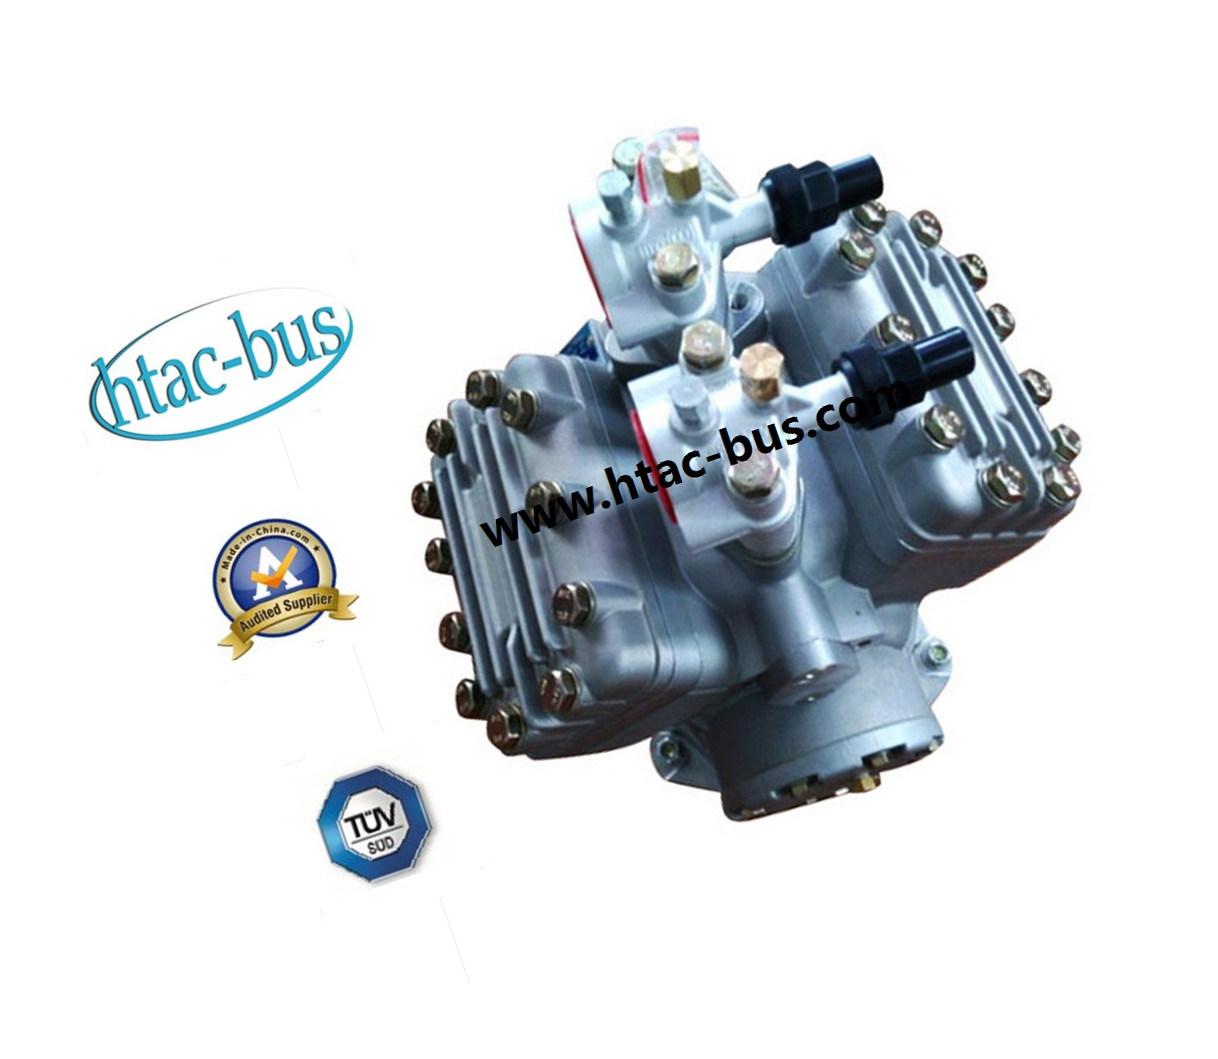 Bus A/C Bock Fkx40-655k Compressor China Supplier